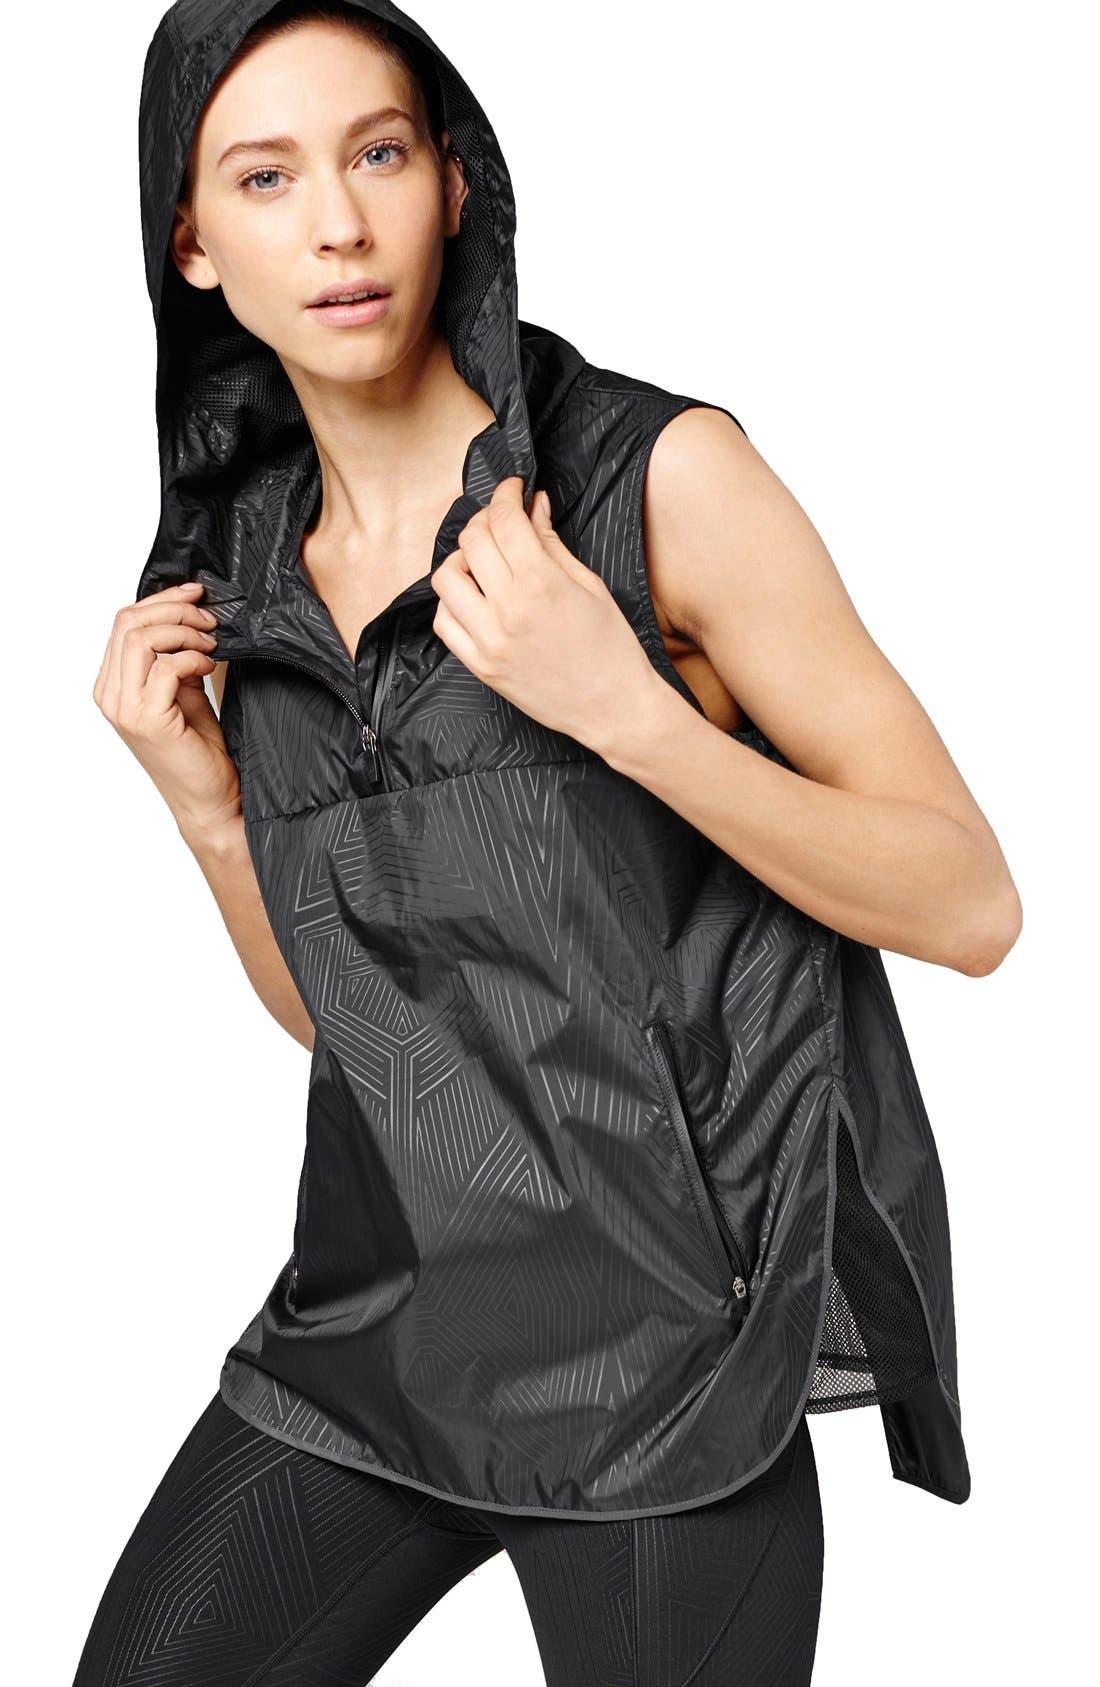 Main Image - IVY PARK® Reflective Print Hooded Sleeveless Jacket